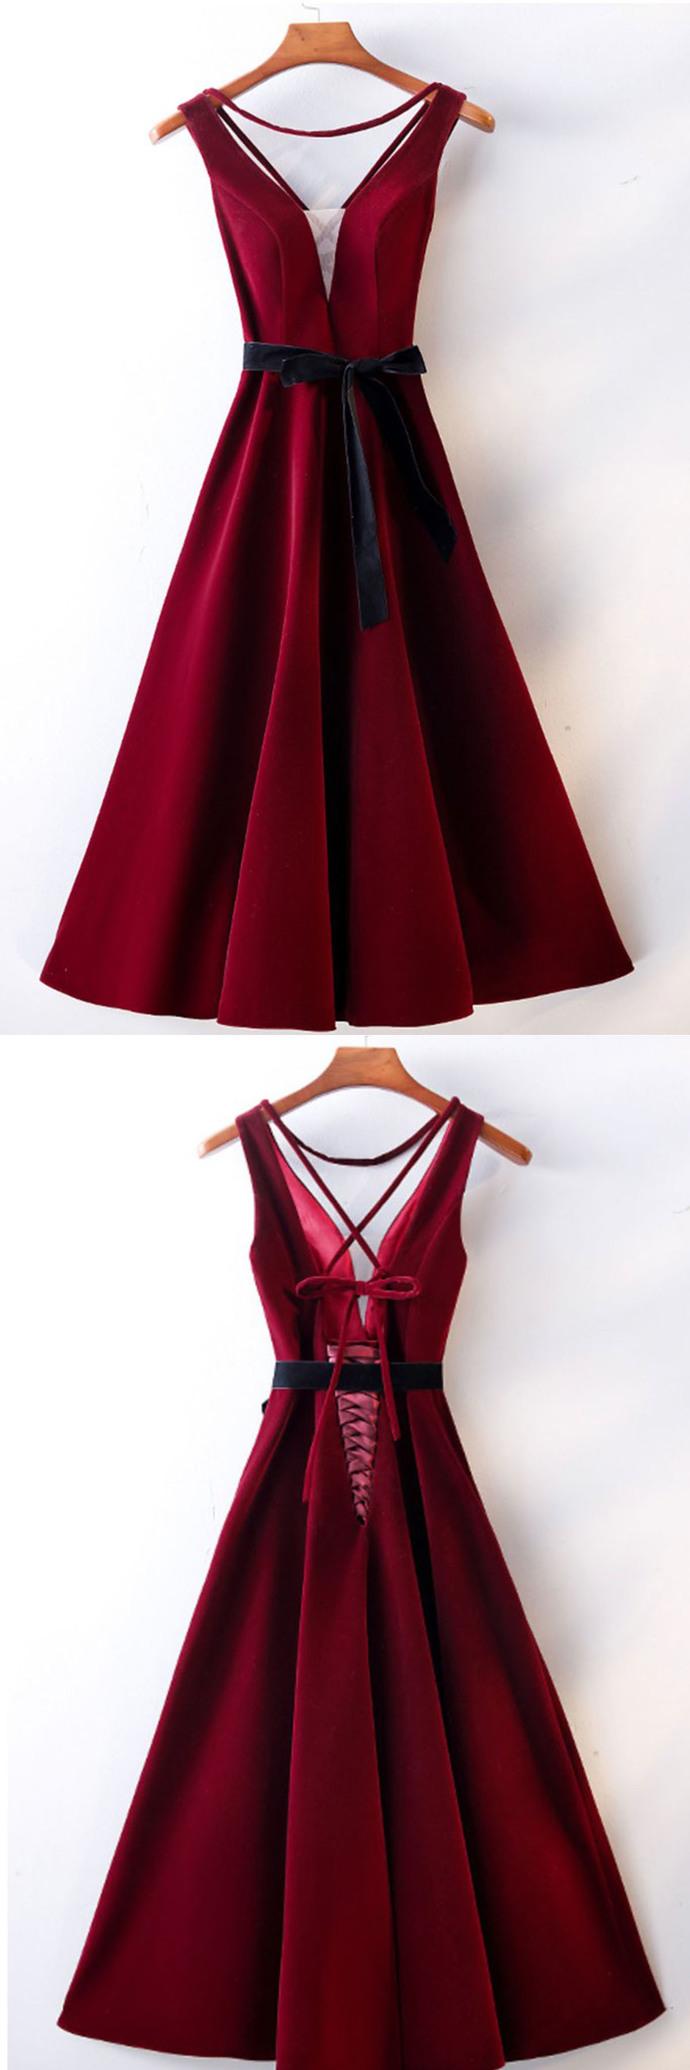 Burgundy Satin V Neck Mid Length Prom Dress, Bridesmaid Dress With Sash D-074